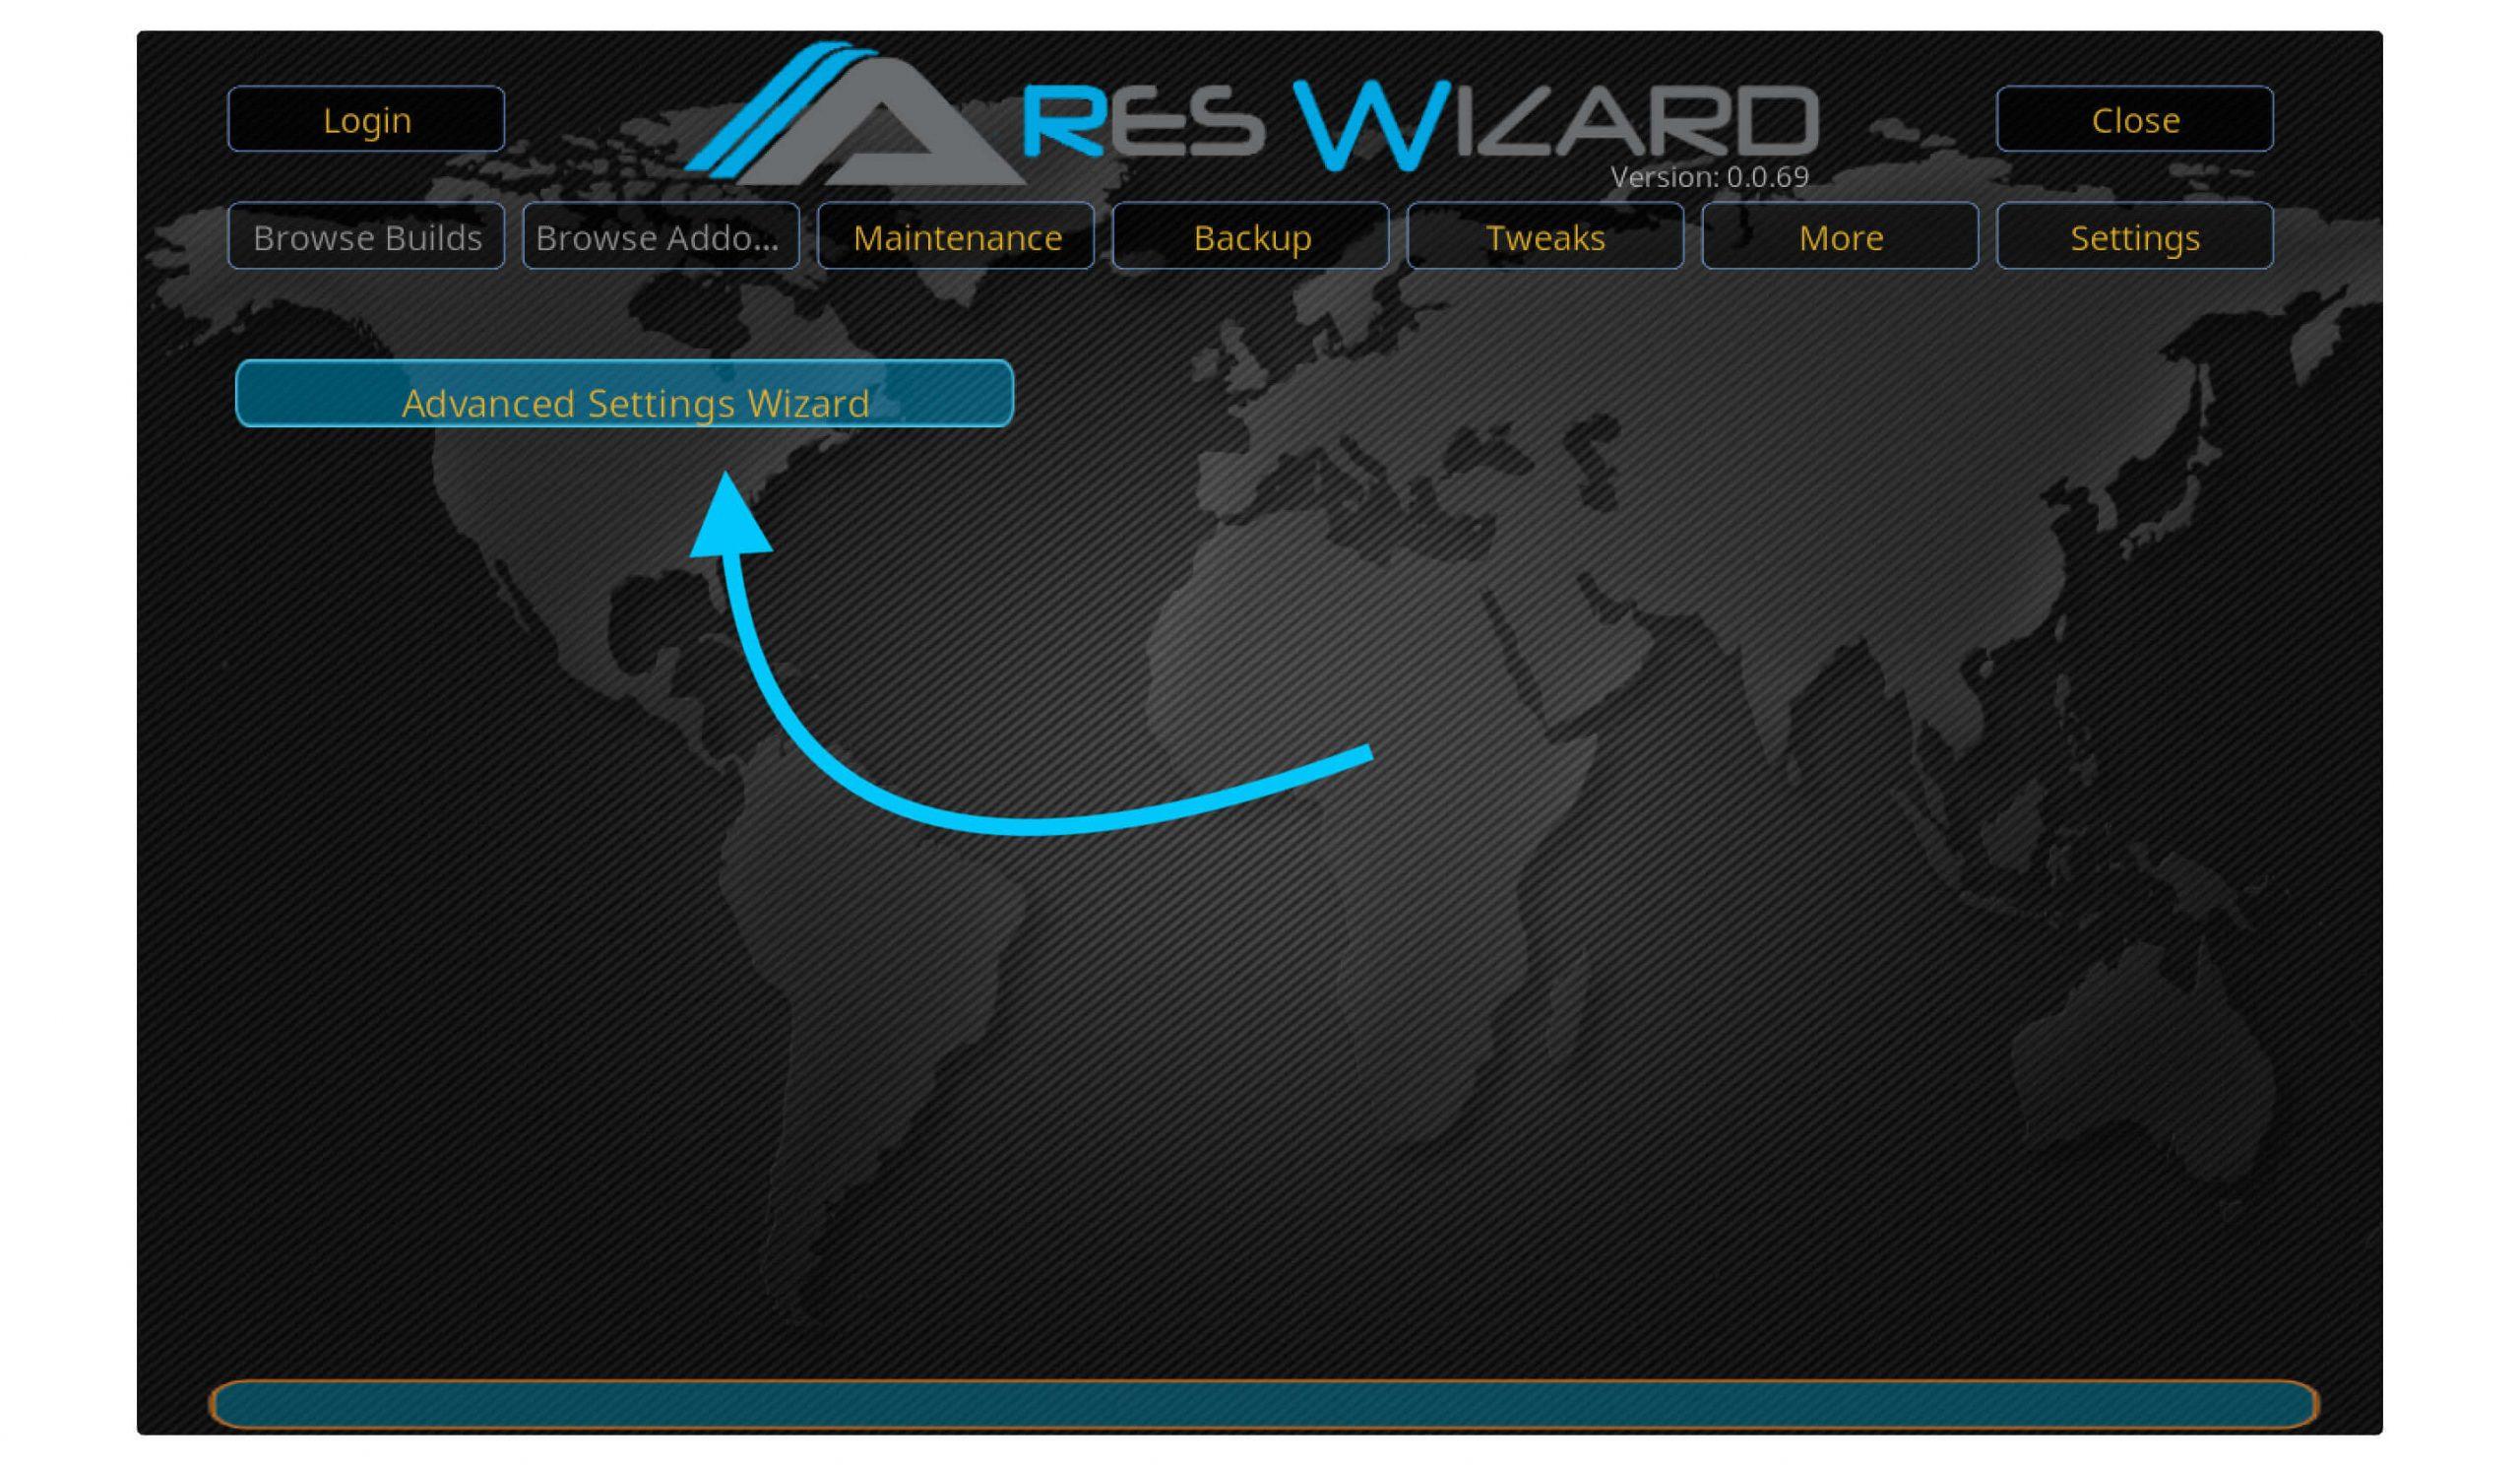 Advanced-Settings-Wizard